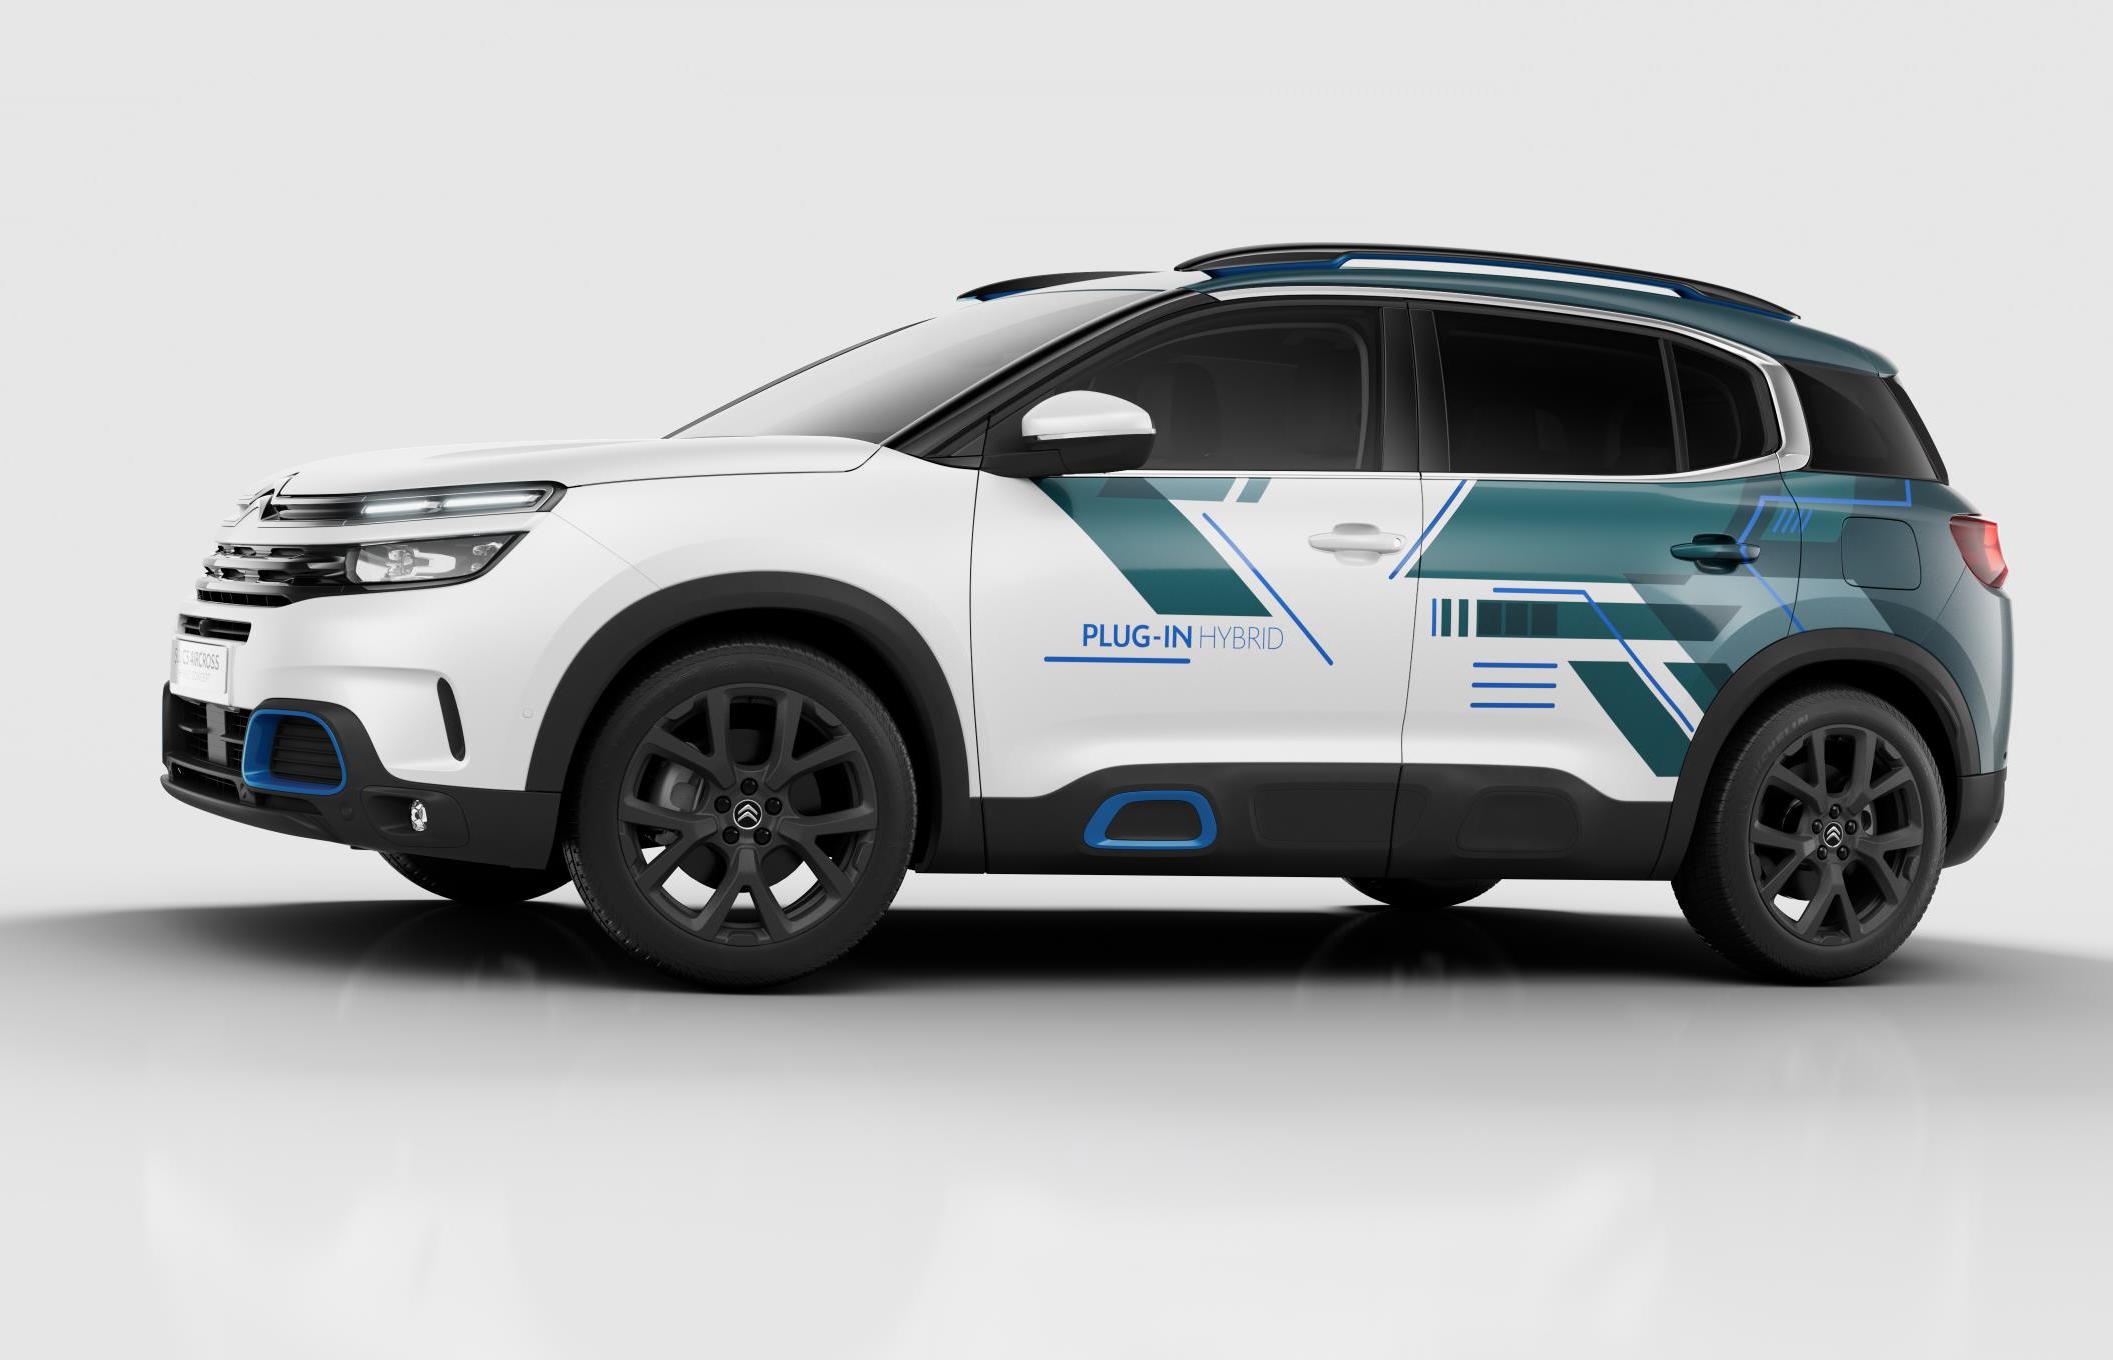 citroen c5 aircross hybrid concept previews 2020 showroom model performancedrive. Black Bedroom Furniture Sets. Home Design Ideas